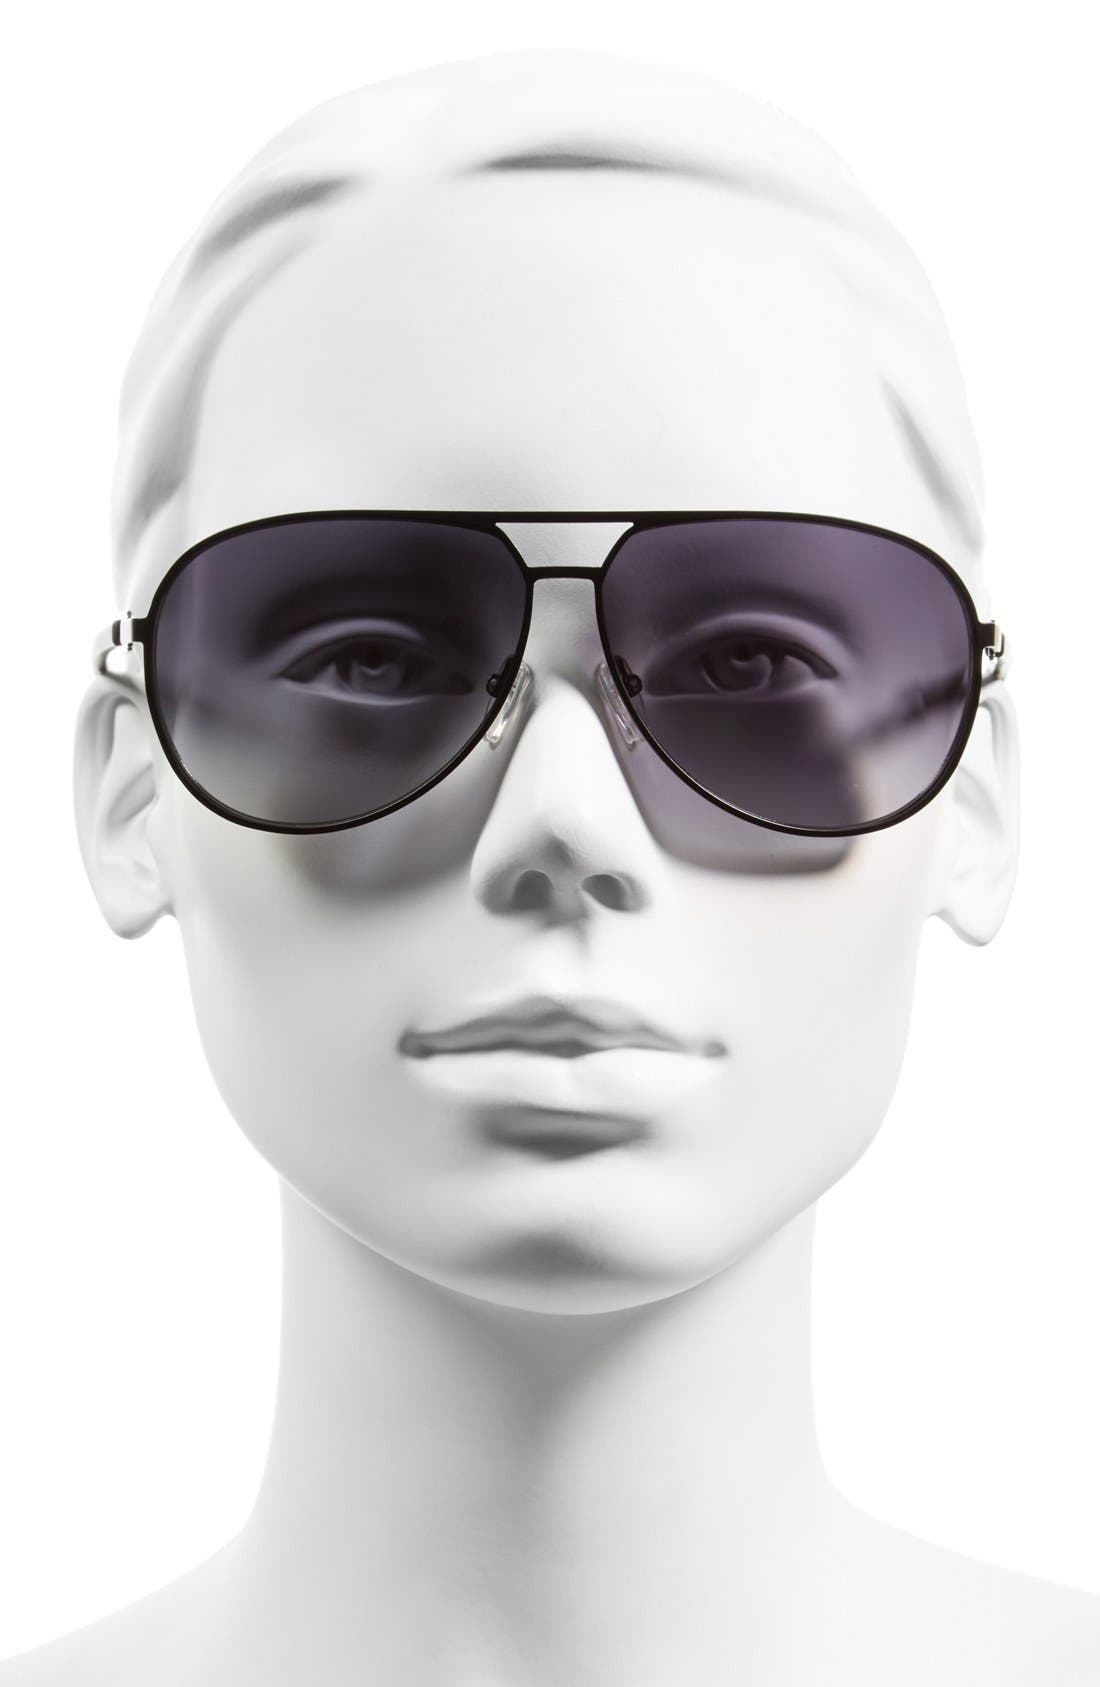 MCQ ALEXANDER MCQUEEN,                             McQ by Alexander McQueen 62mm Stainless Steel Aviator Sunglasses,                             Alternate thumbnail 2, color,                             001